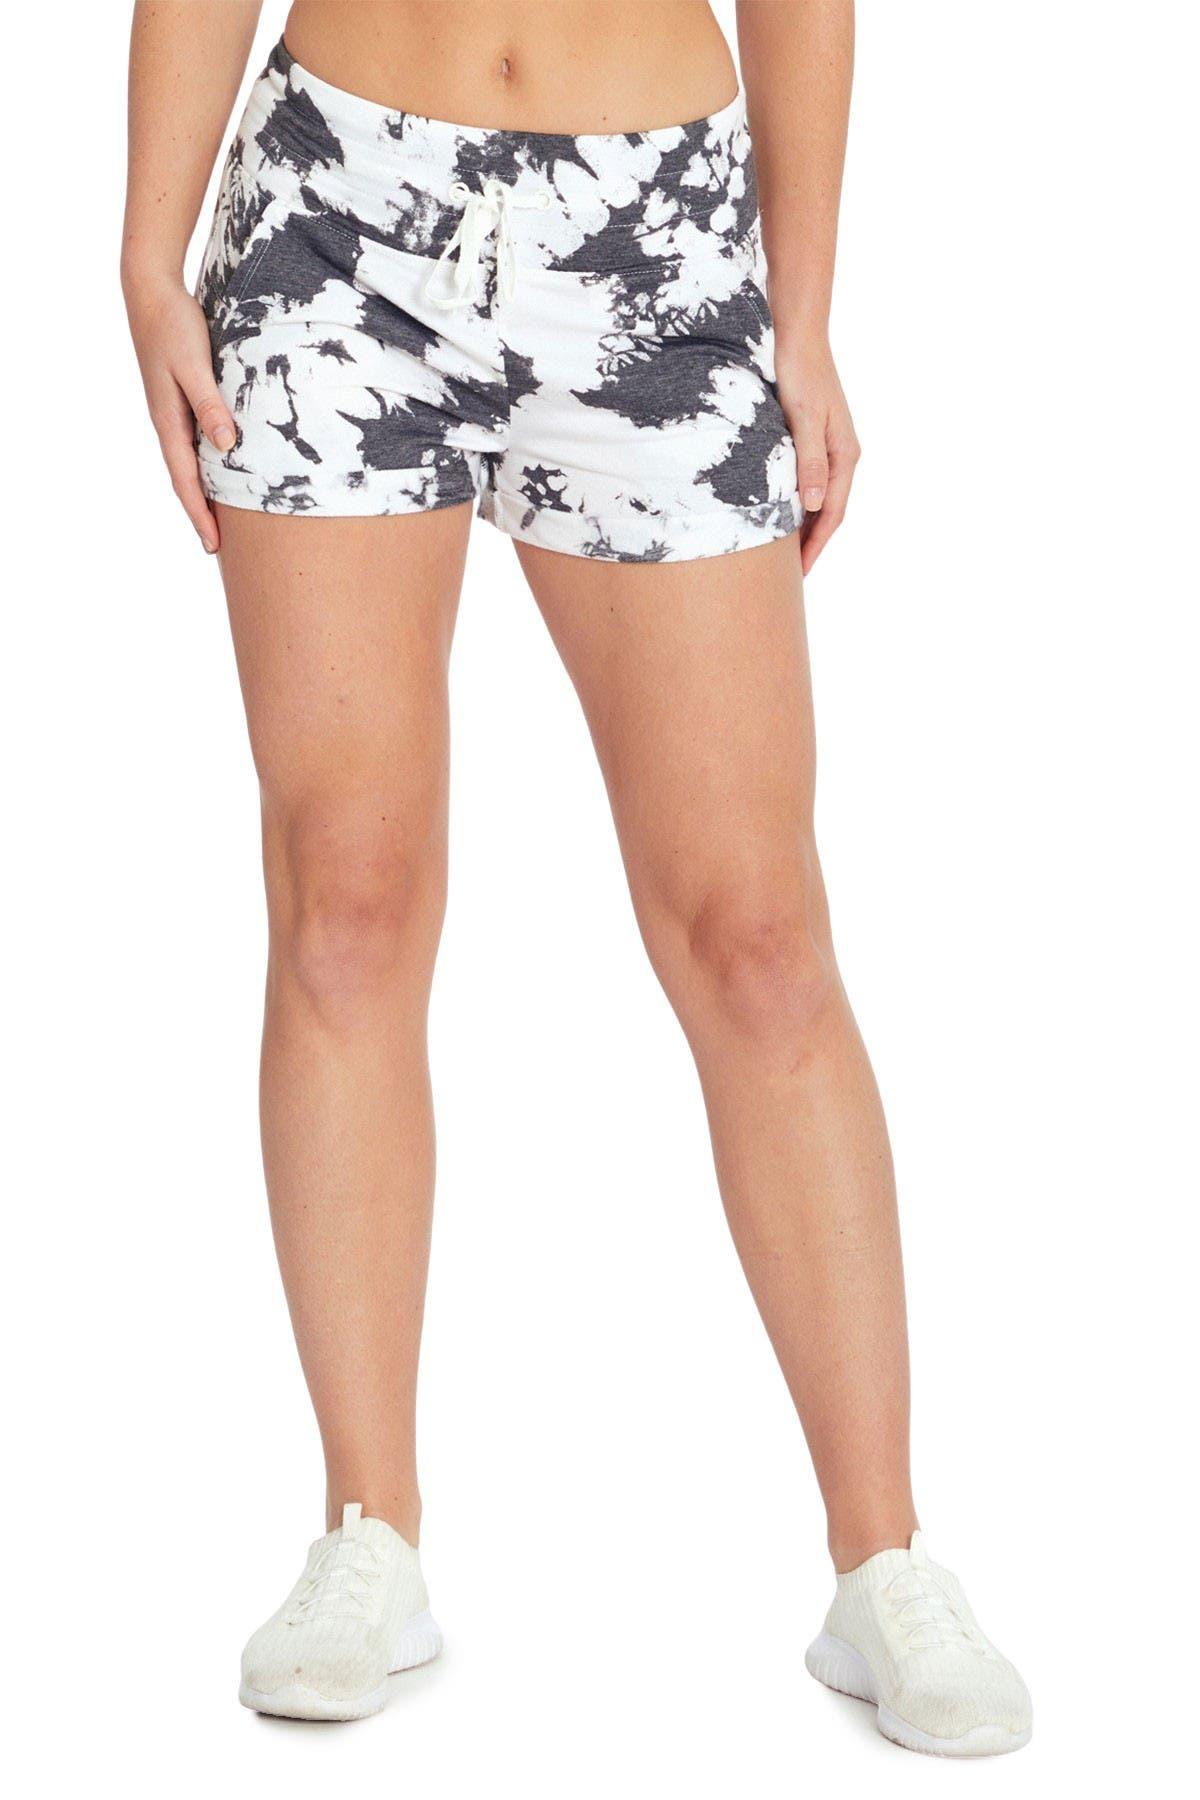 Image of Jessica Simpson Danni High Waisted Drawstring Shorts